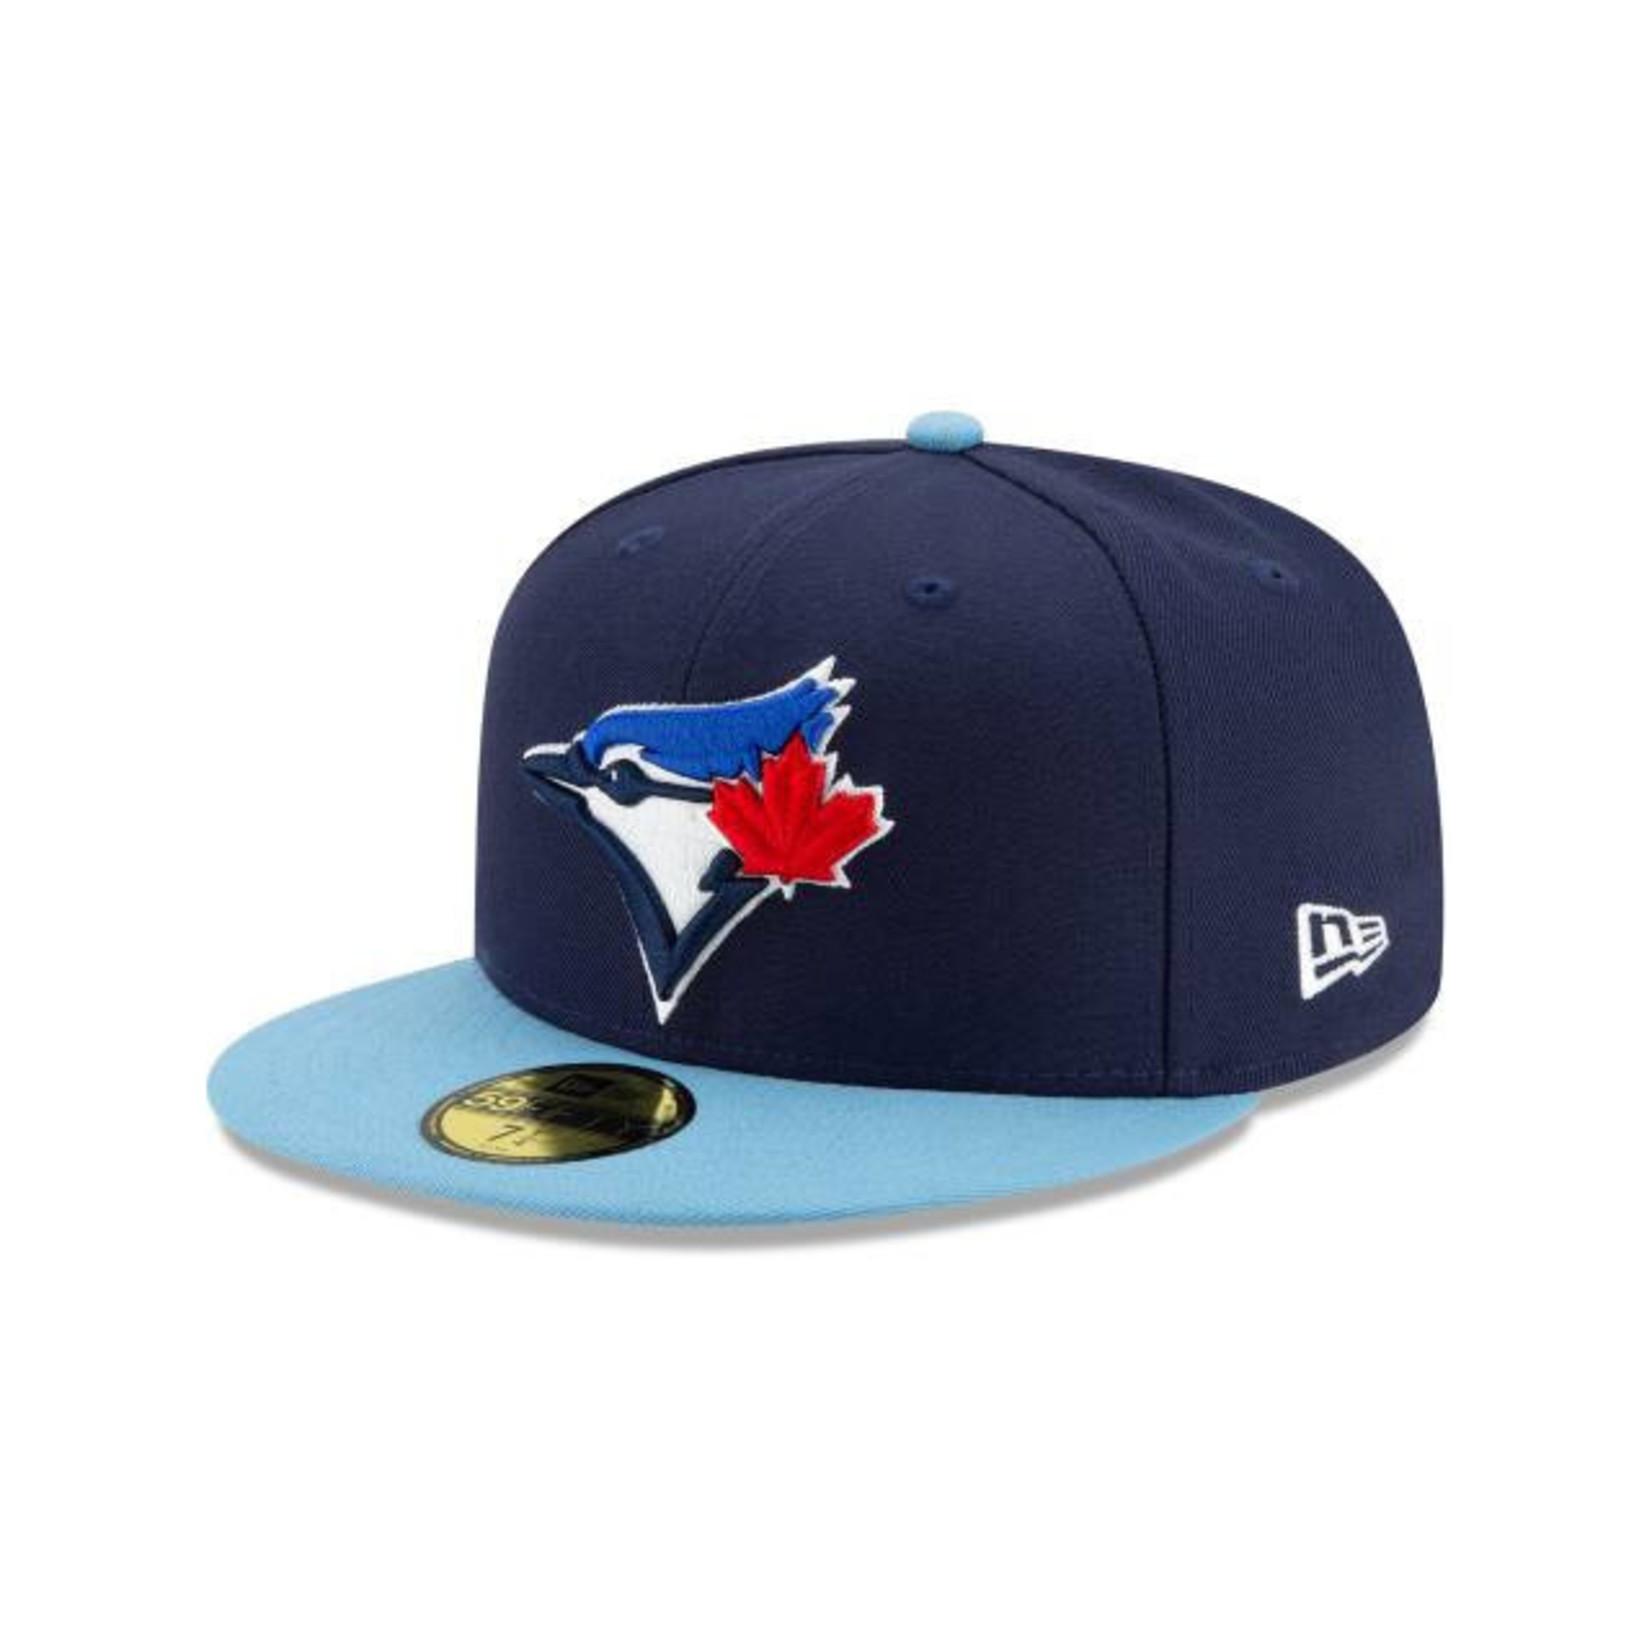 New Era New Era Hat, JR On-Field AC, MLB, Toronto Blue Jays Alt4